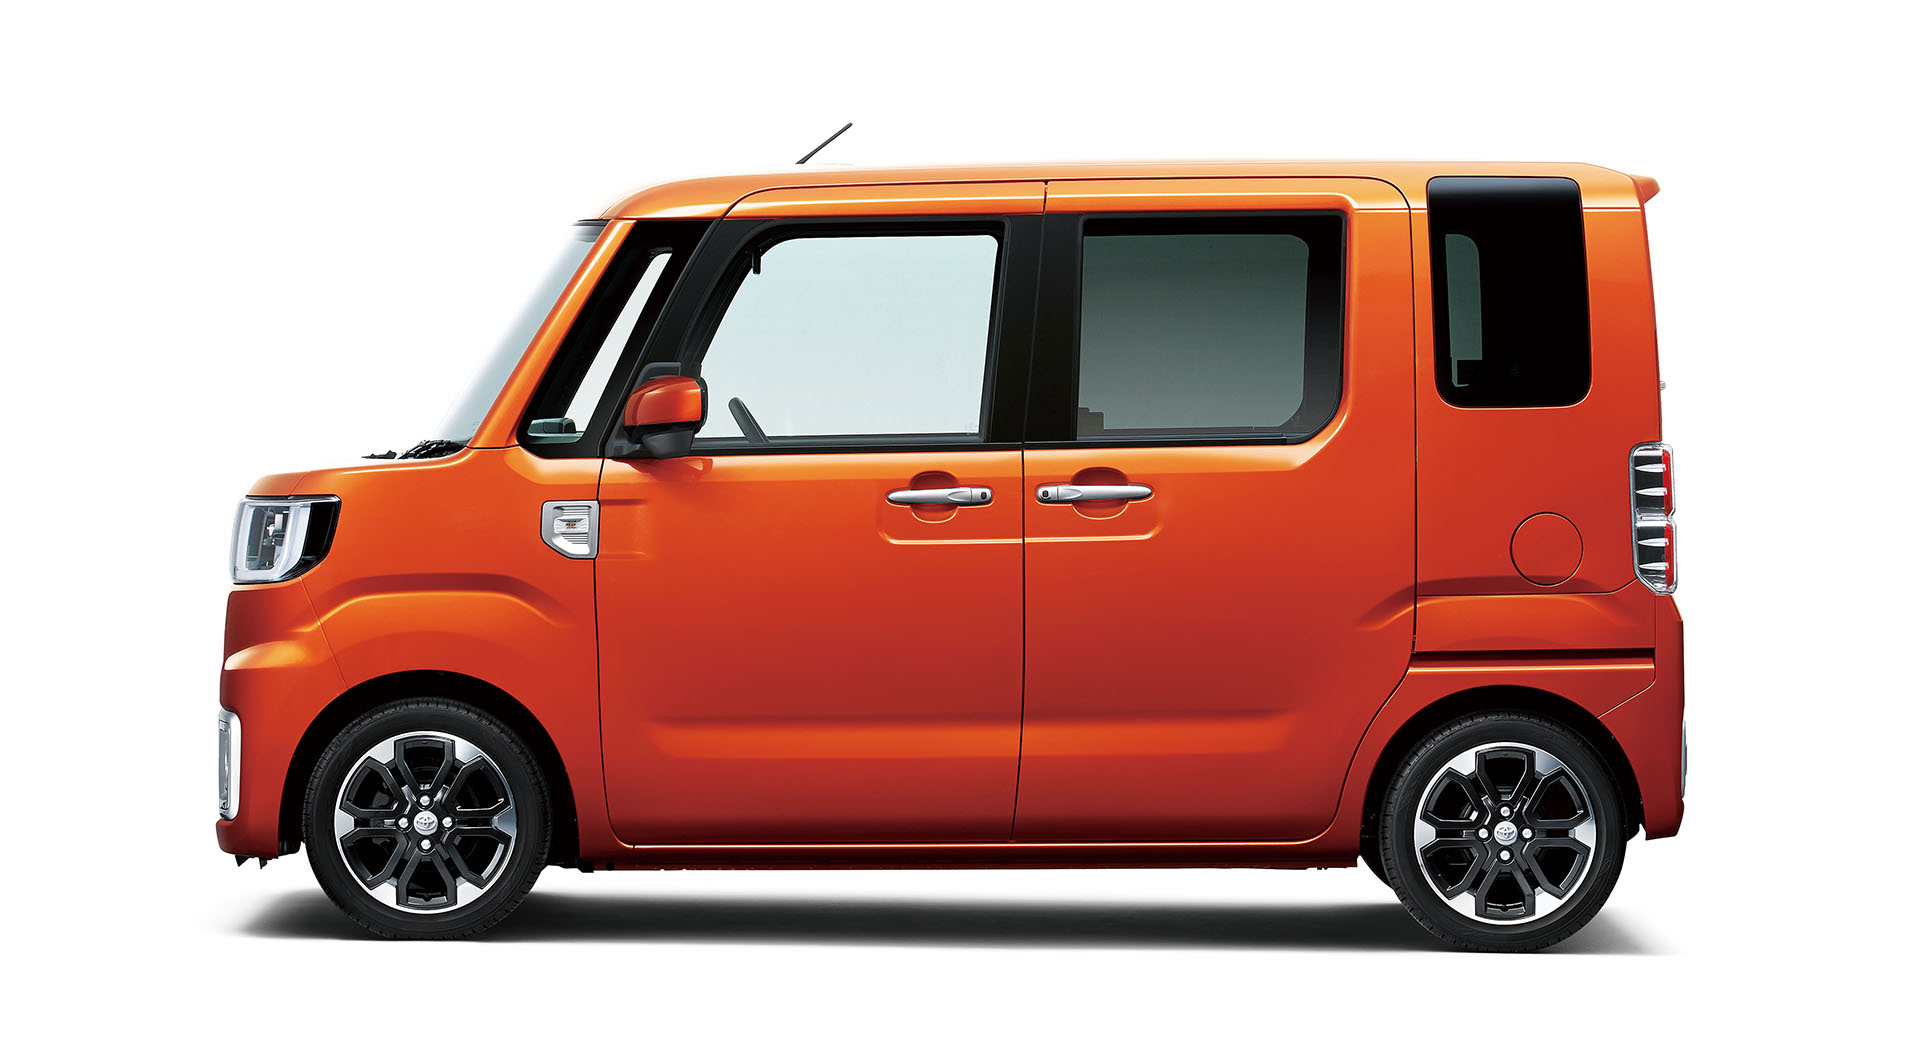 Toyota Pixis Mega Is Japan S Newest Ultra Cute Kei Car Autoevolution